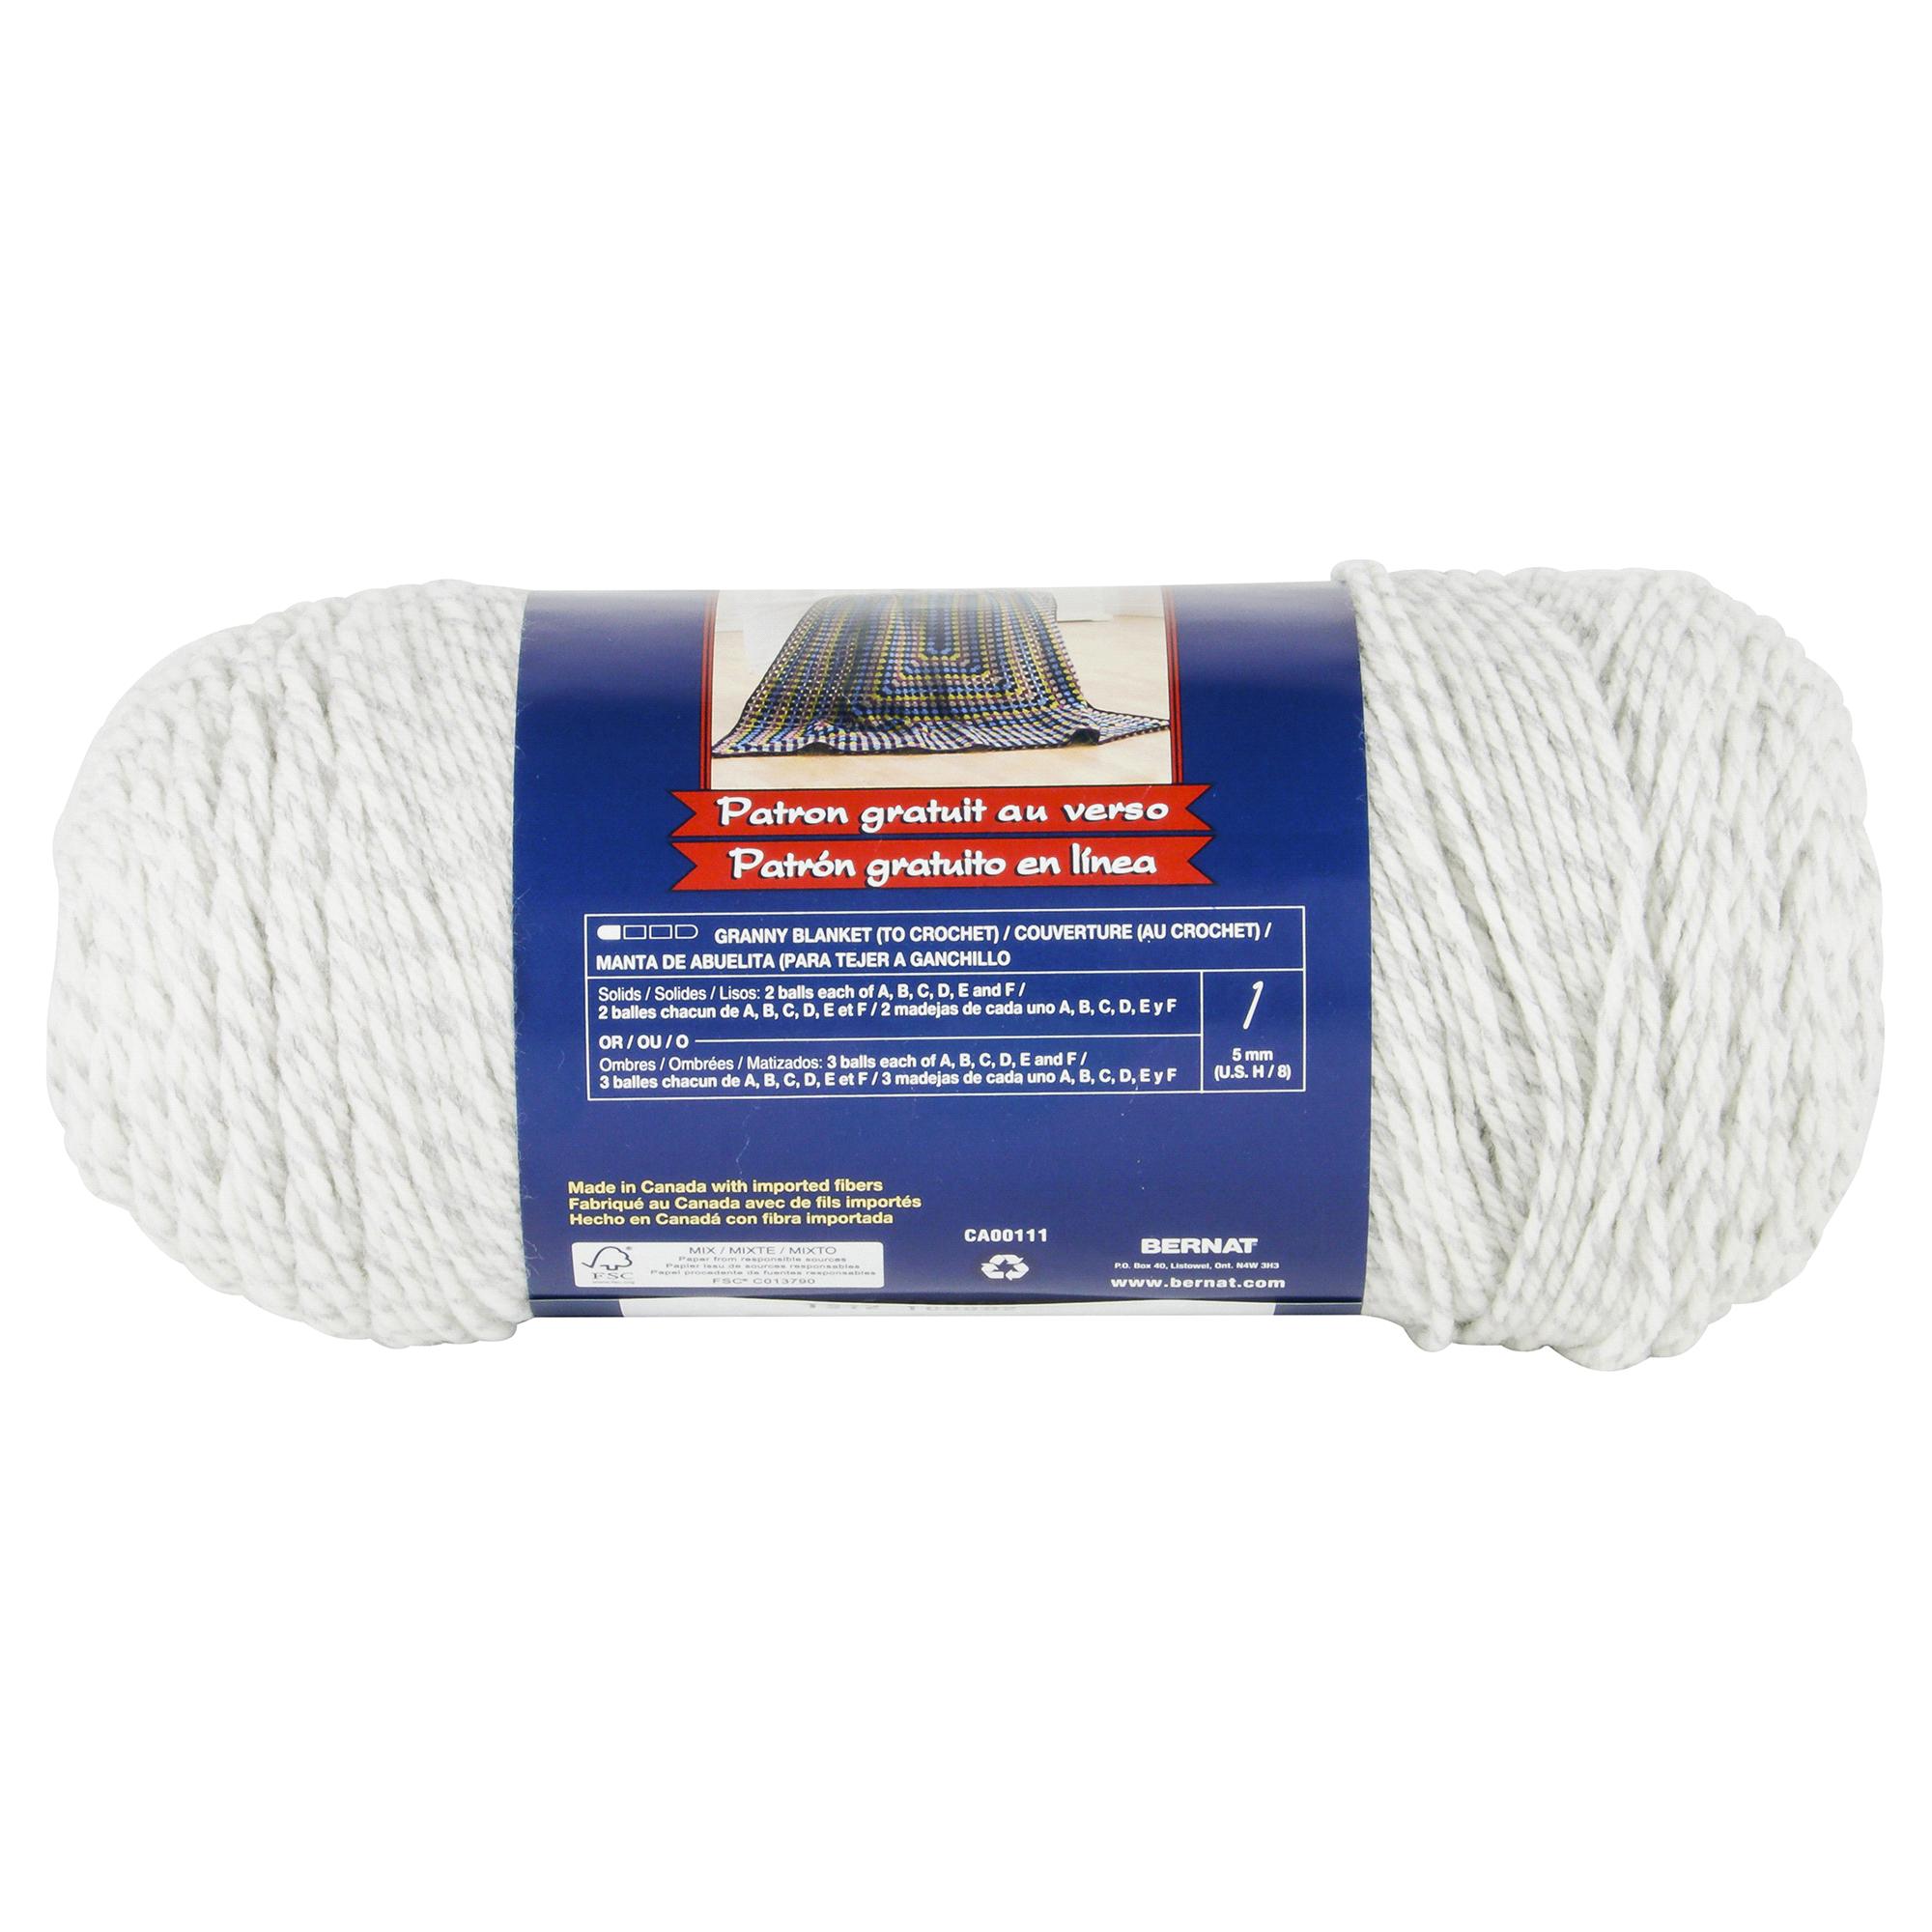 Bernat Super Value Yarn - Grey Ragg | Meijer.com